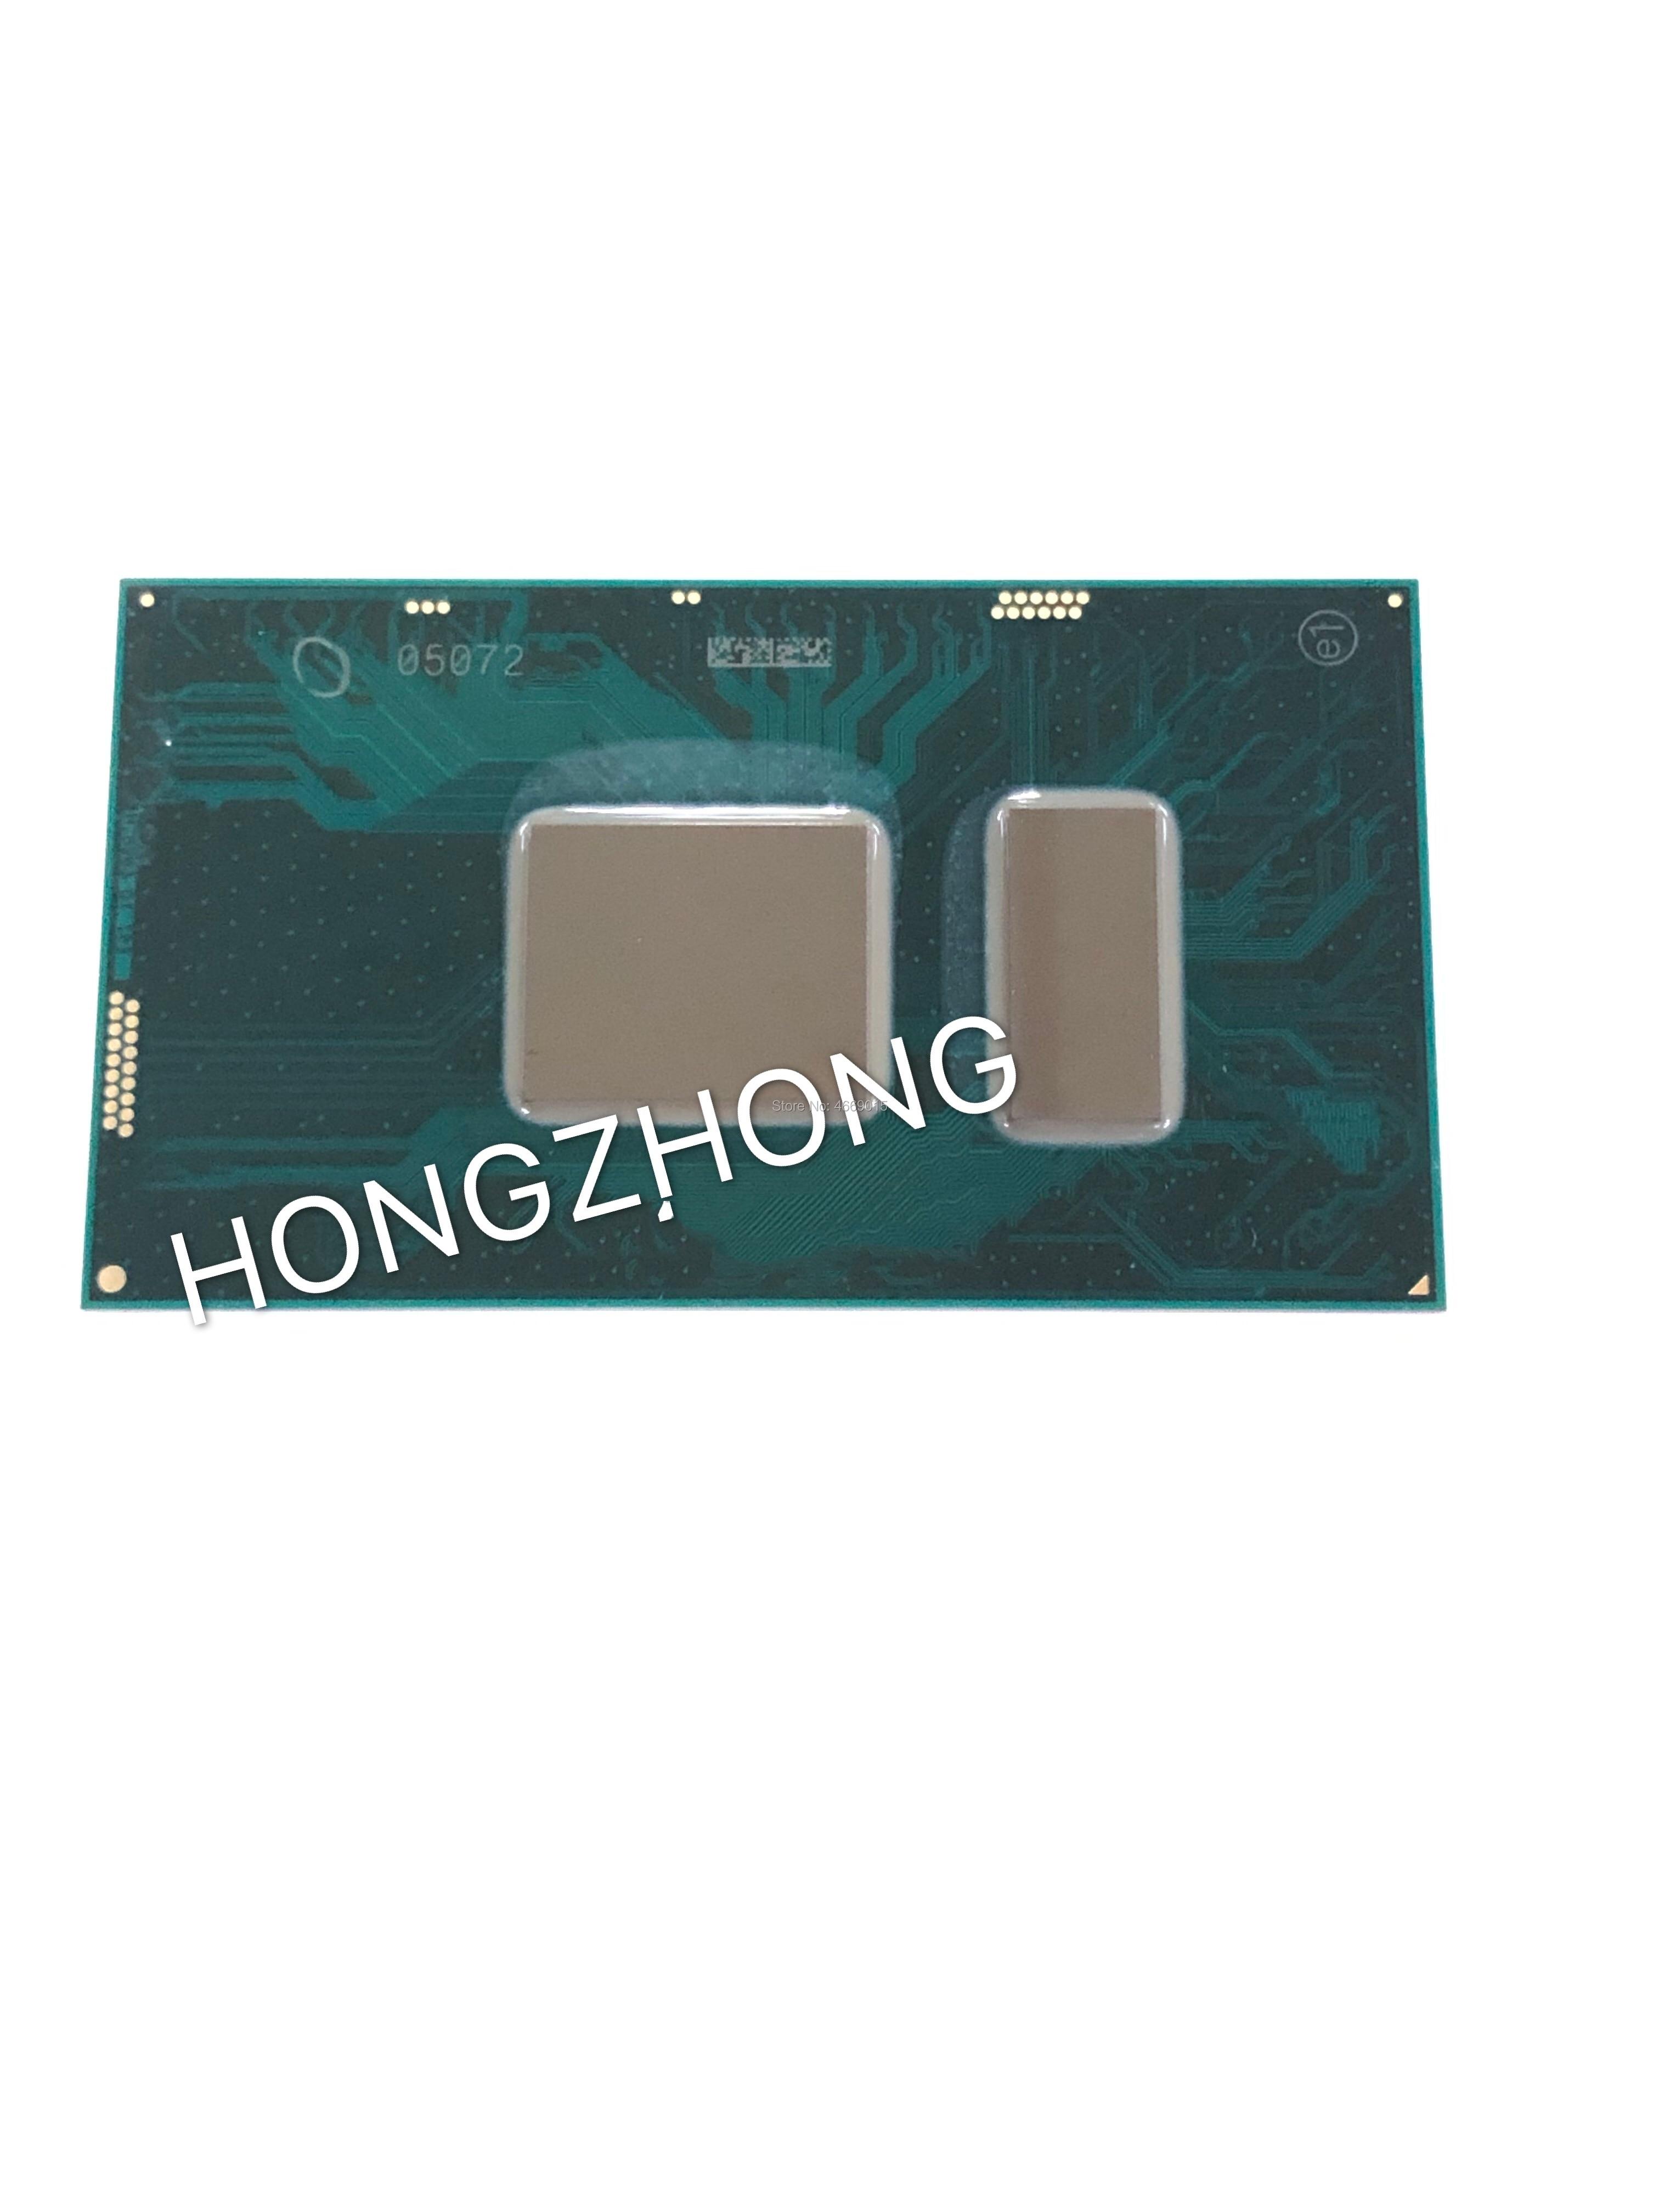 Clearance Sale√100% test very good product SR3YJ SR3W0 SR3YY SR3N6 SR188 SR1ZT BGA chipset